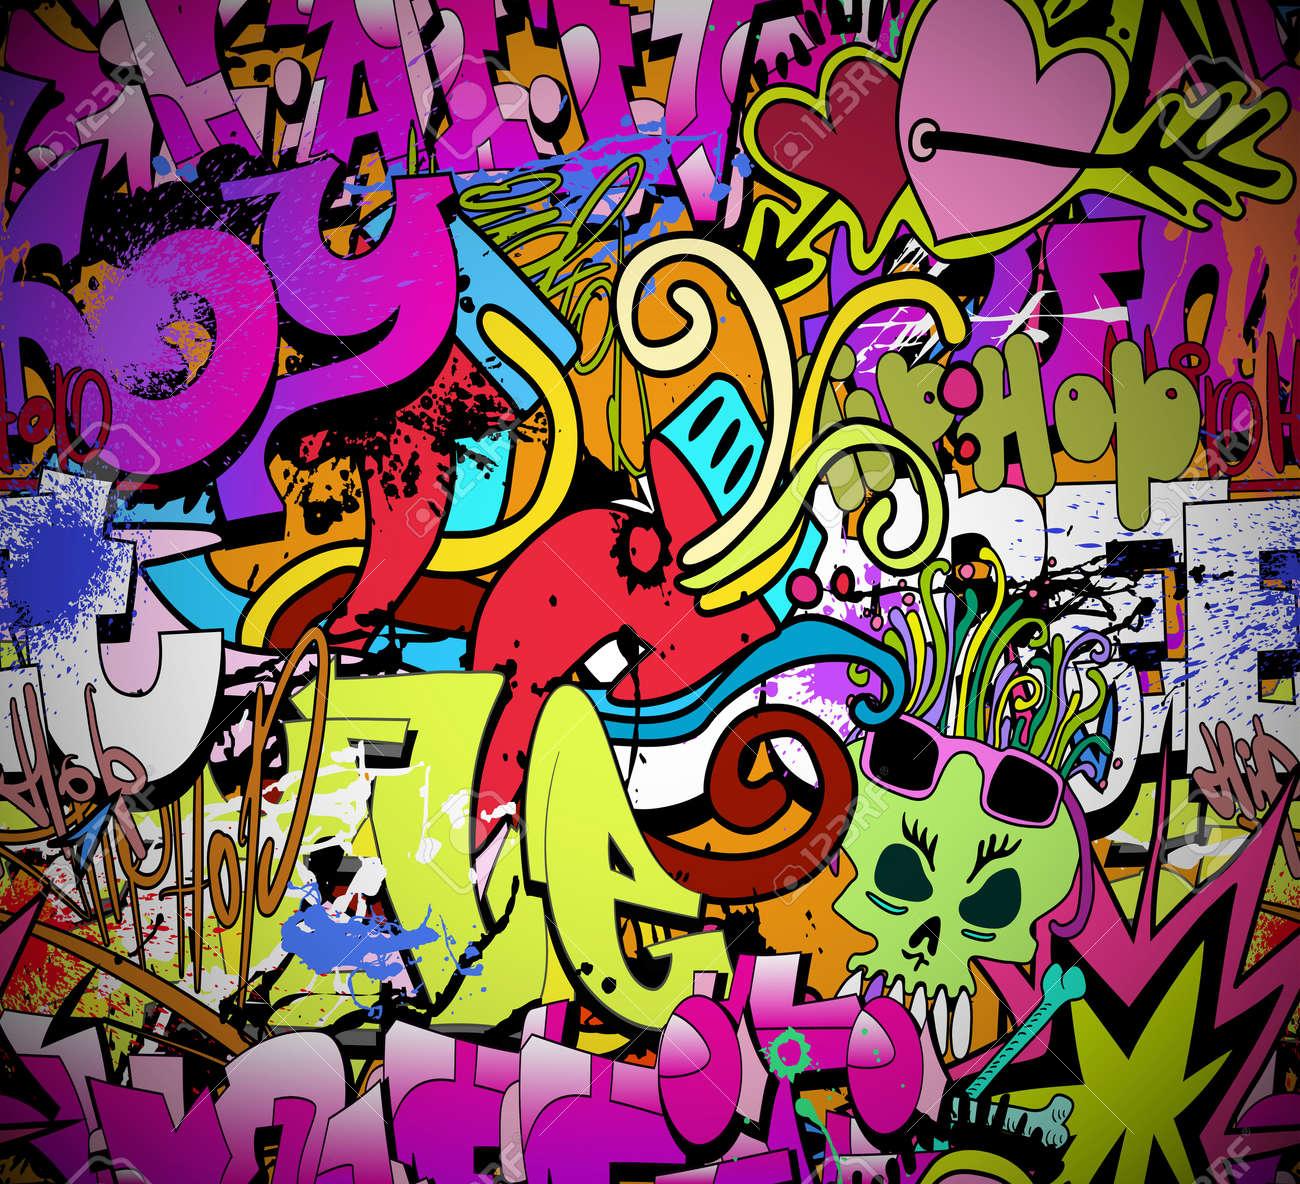 Graffiti art background - Graffiti Wall Art Background Hip Hop Style Seamless Texture Pattern Stock Vector 18120296